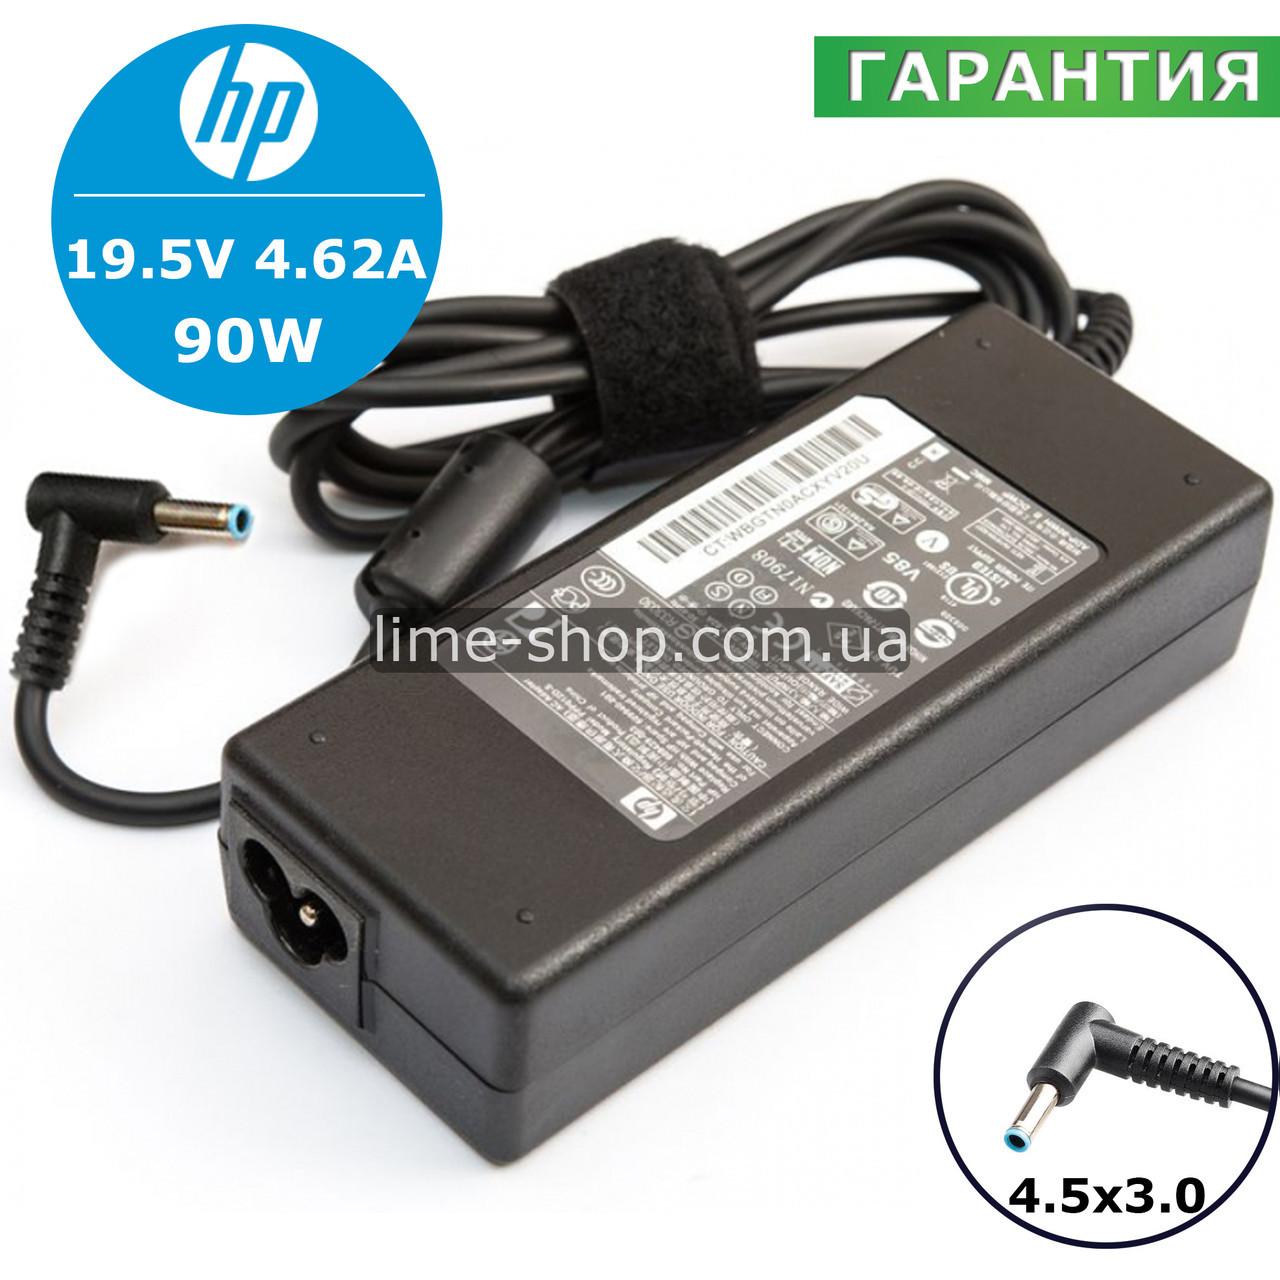 HP Pavilion 10z-f100 Driver